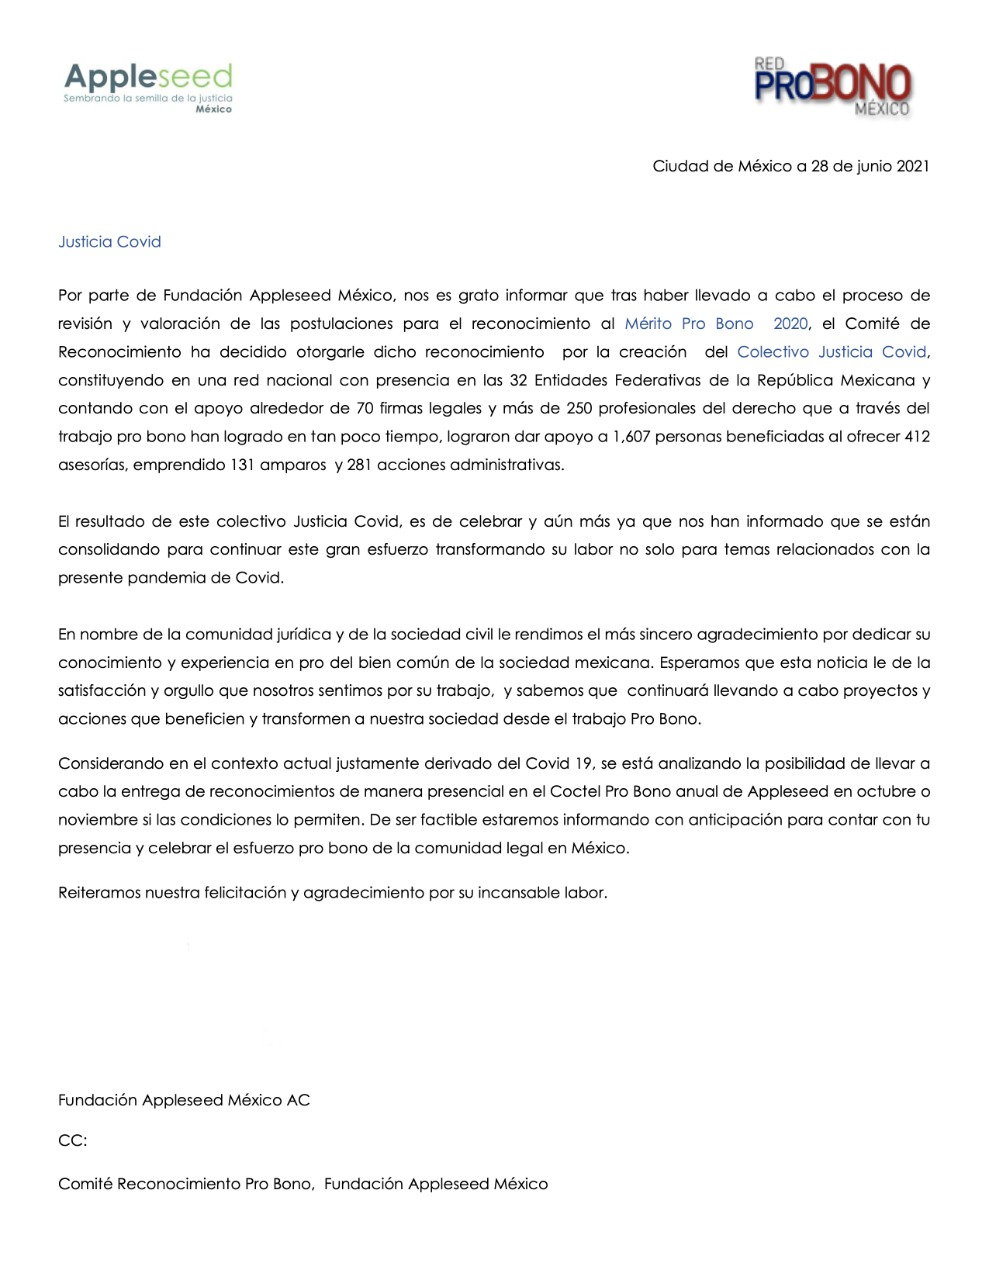 Carta de Appleseed